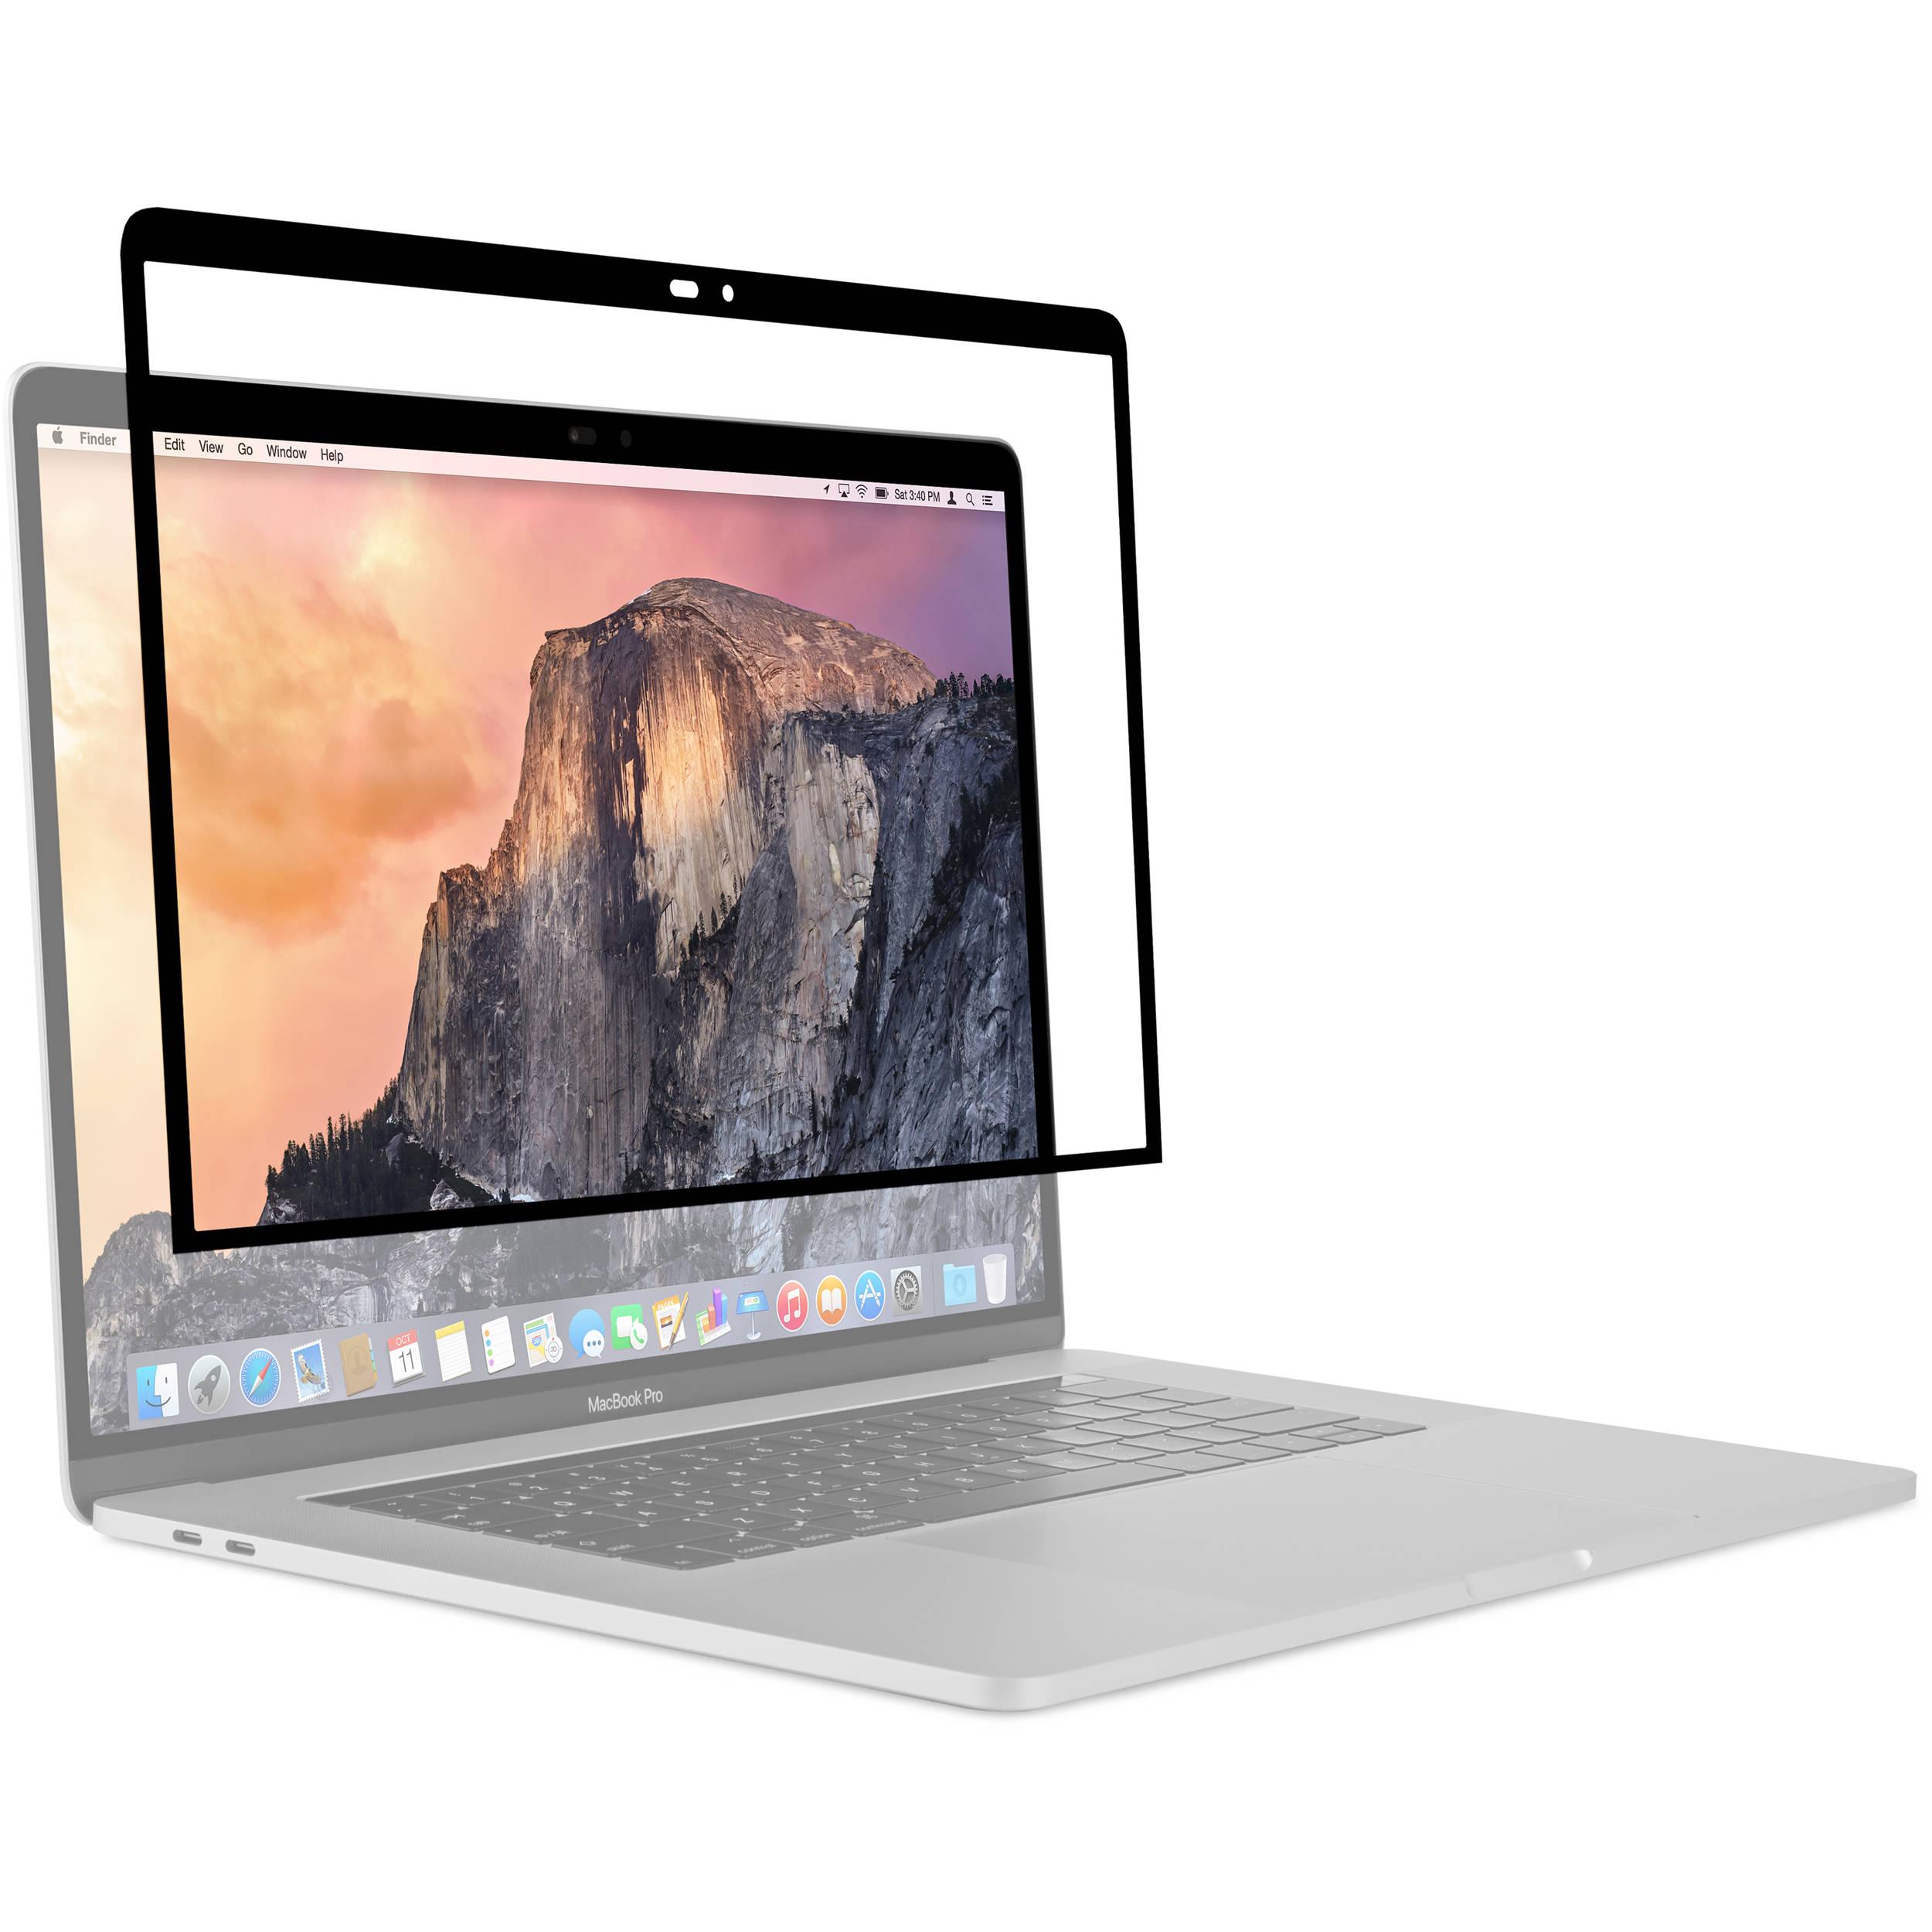 moshi macbook pro 15  Moshi iVisor Screen Protector for MacBook Pro 99MO040910 B&H